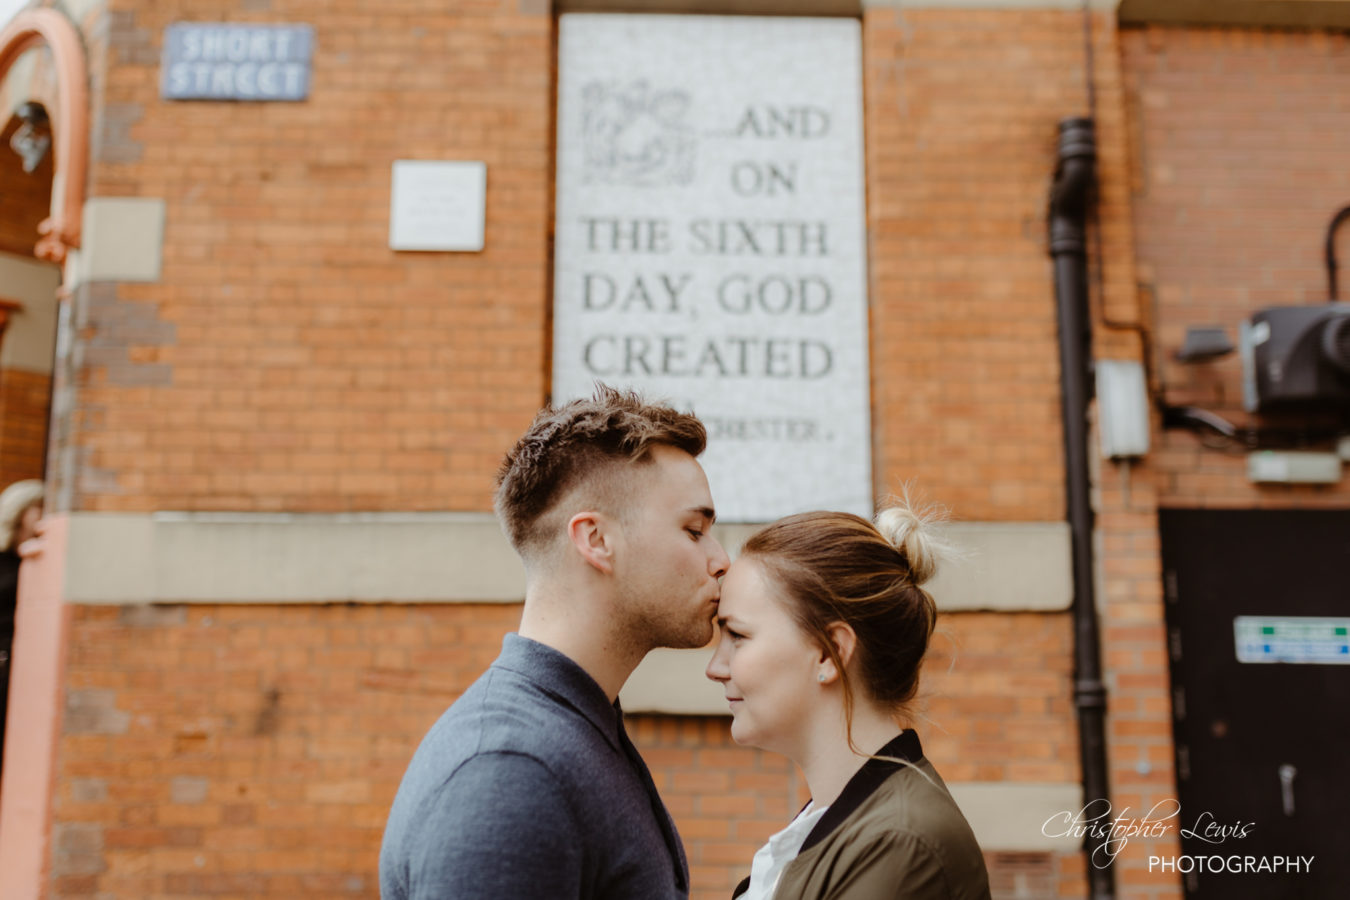 Northern-Quarter-Manchester-Pre-Wedding-Photoshoot-26